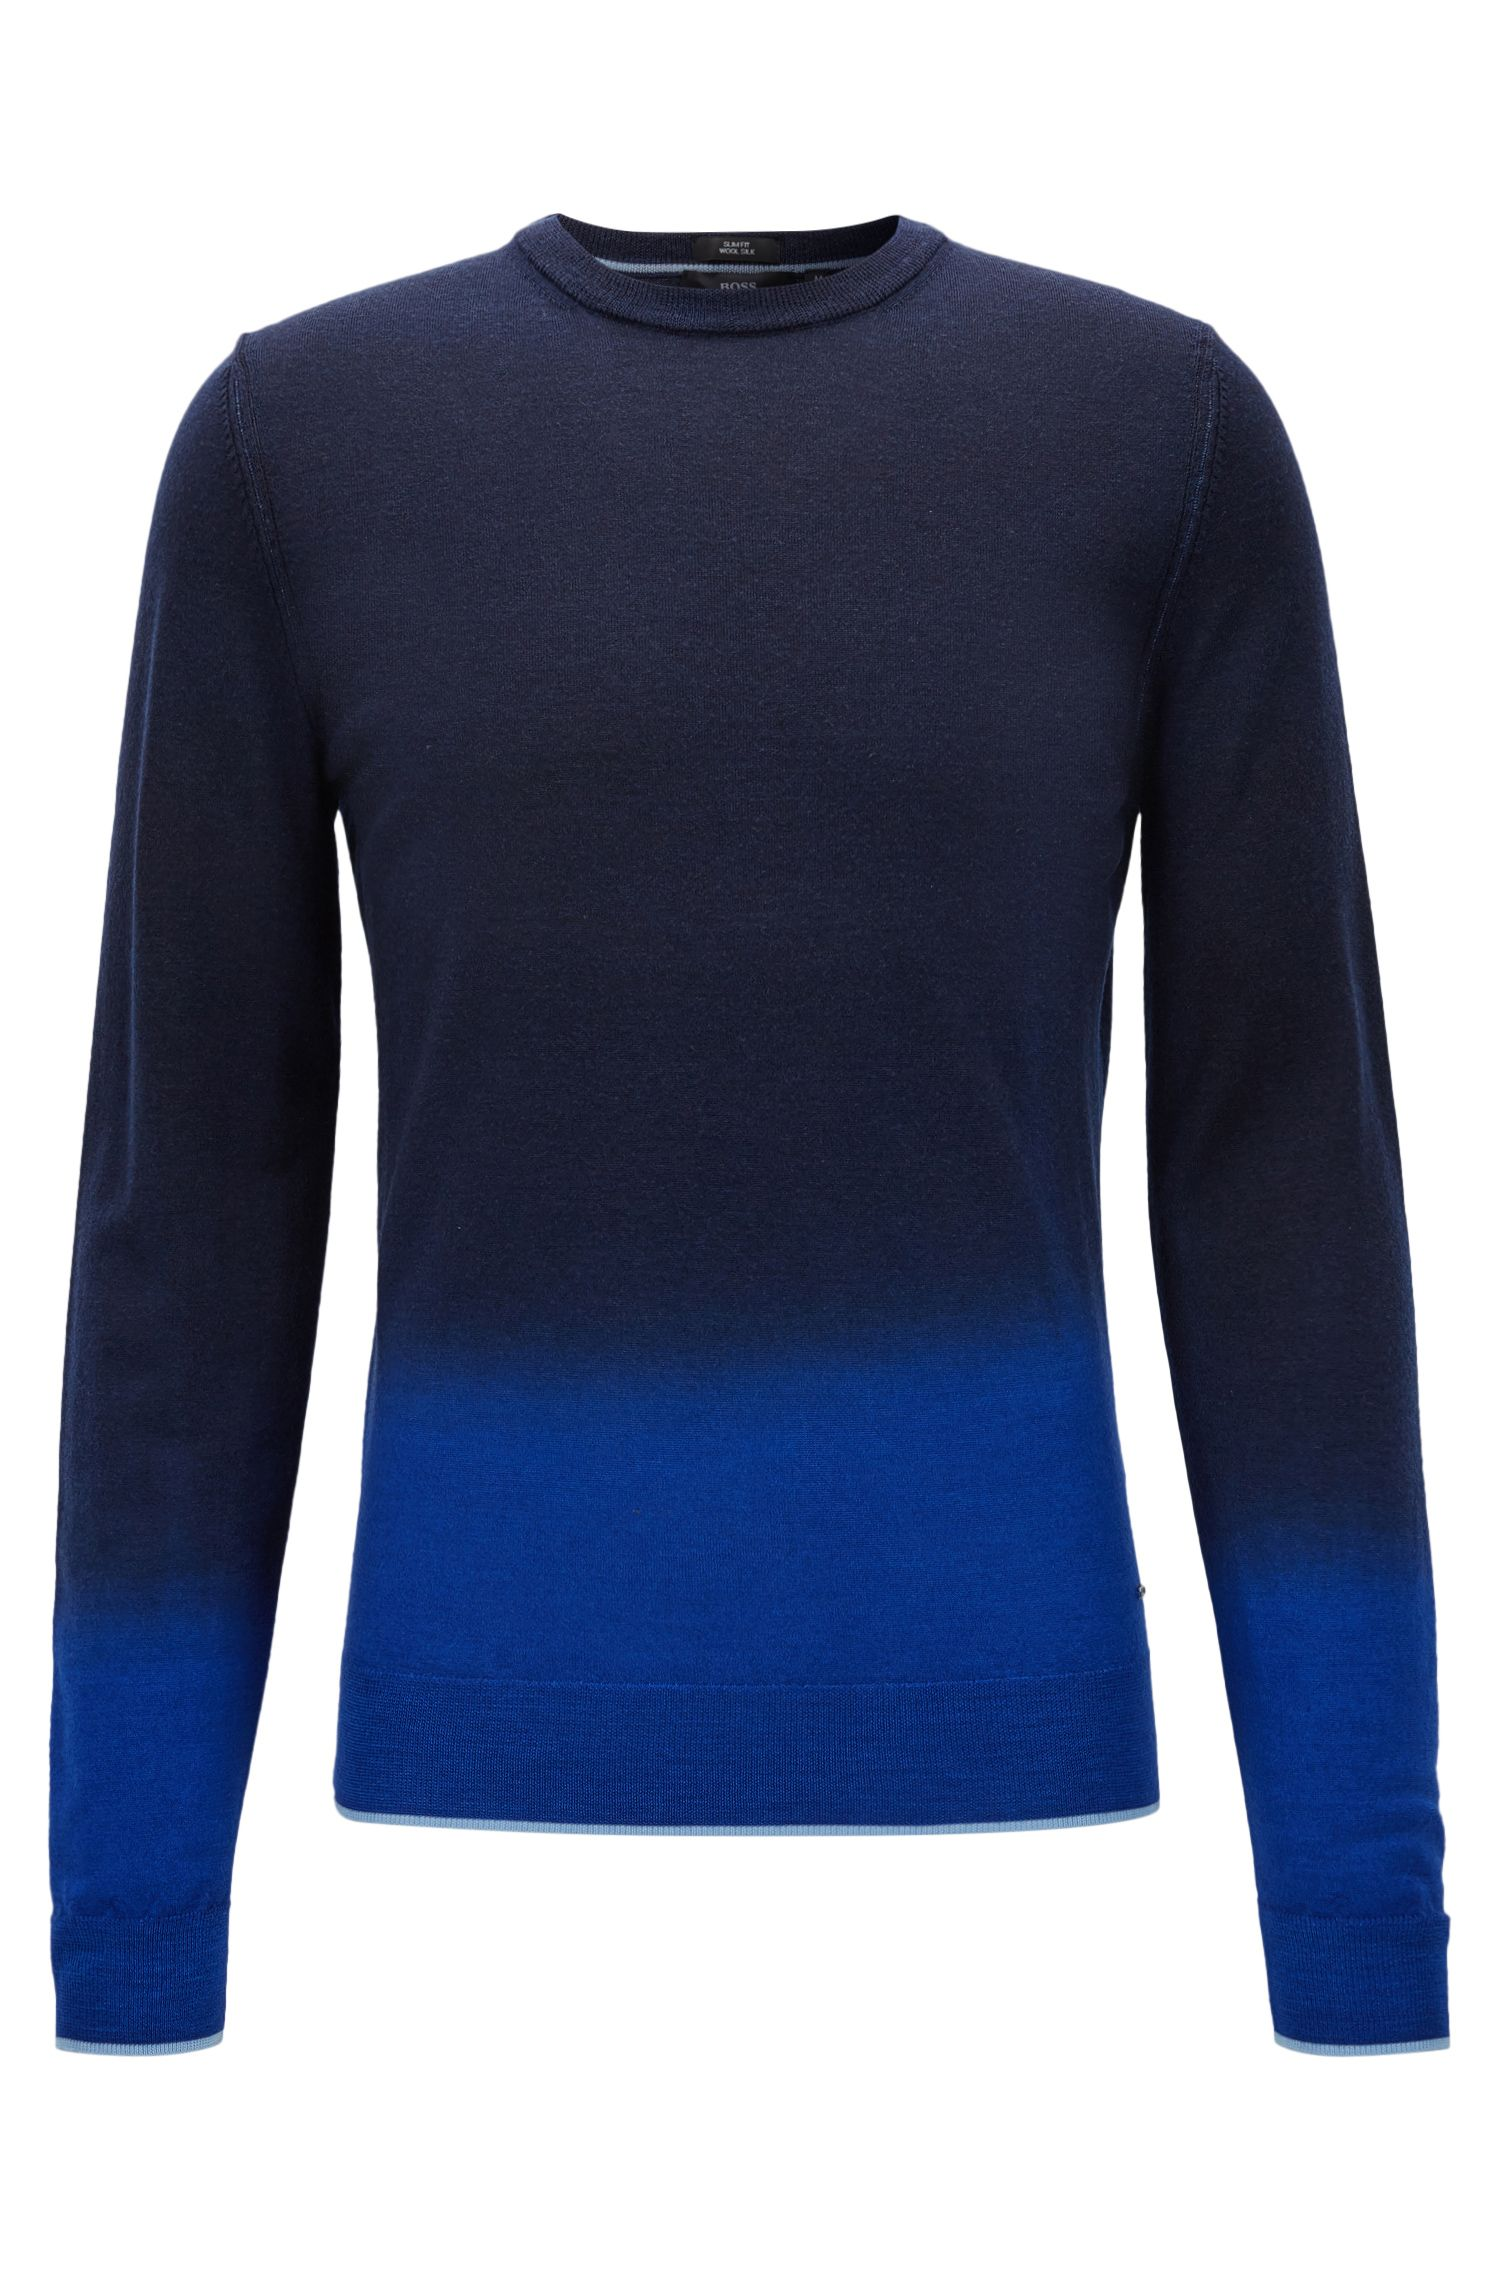 Slim-fit dip-dye sweater in a wool blend